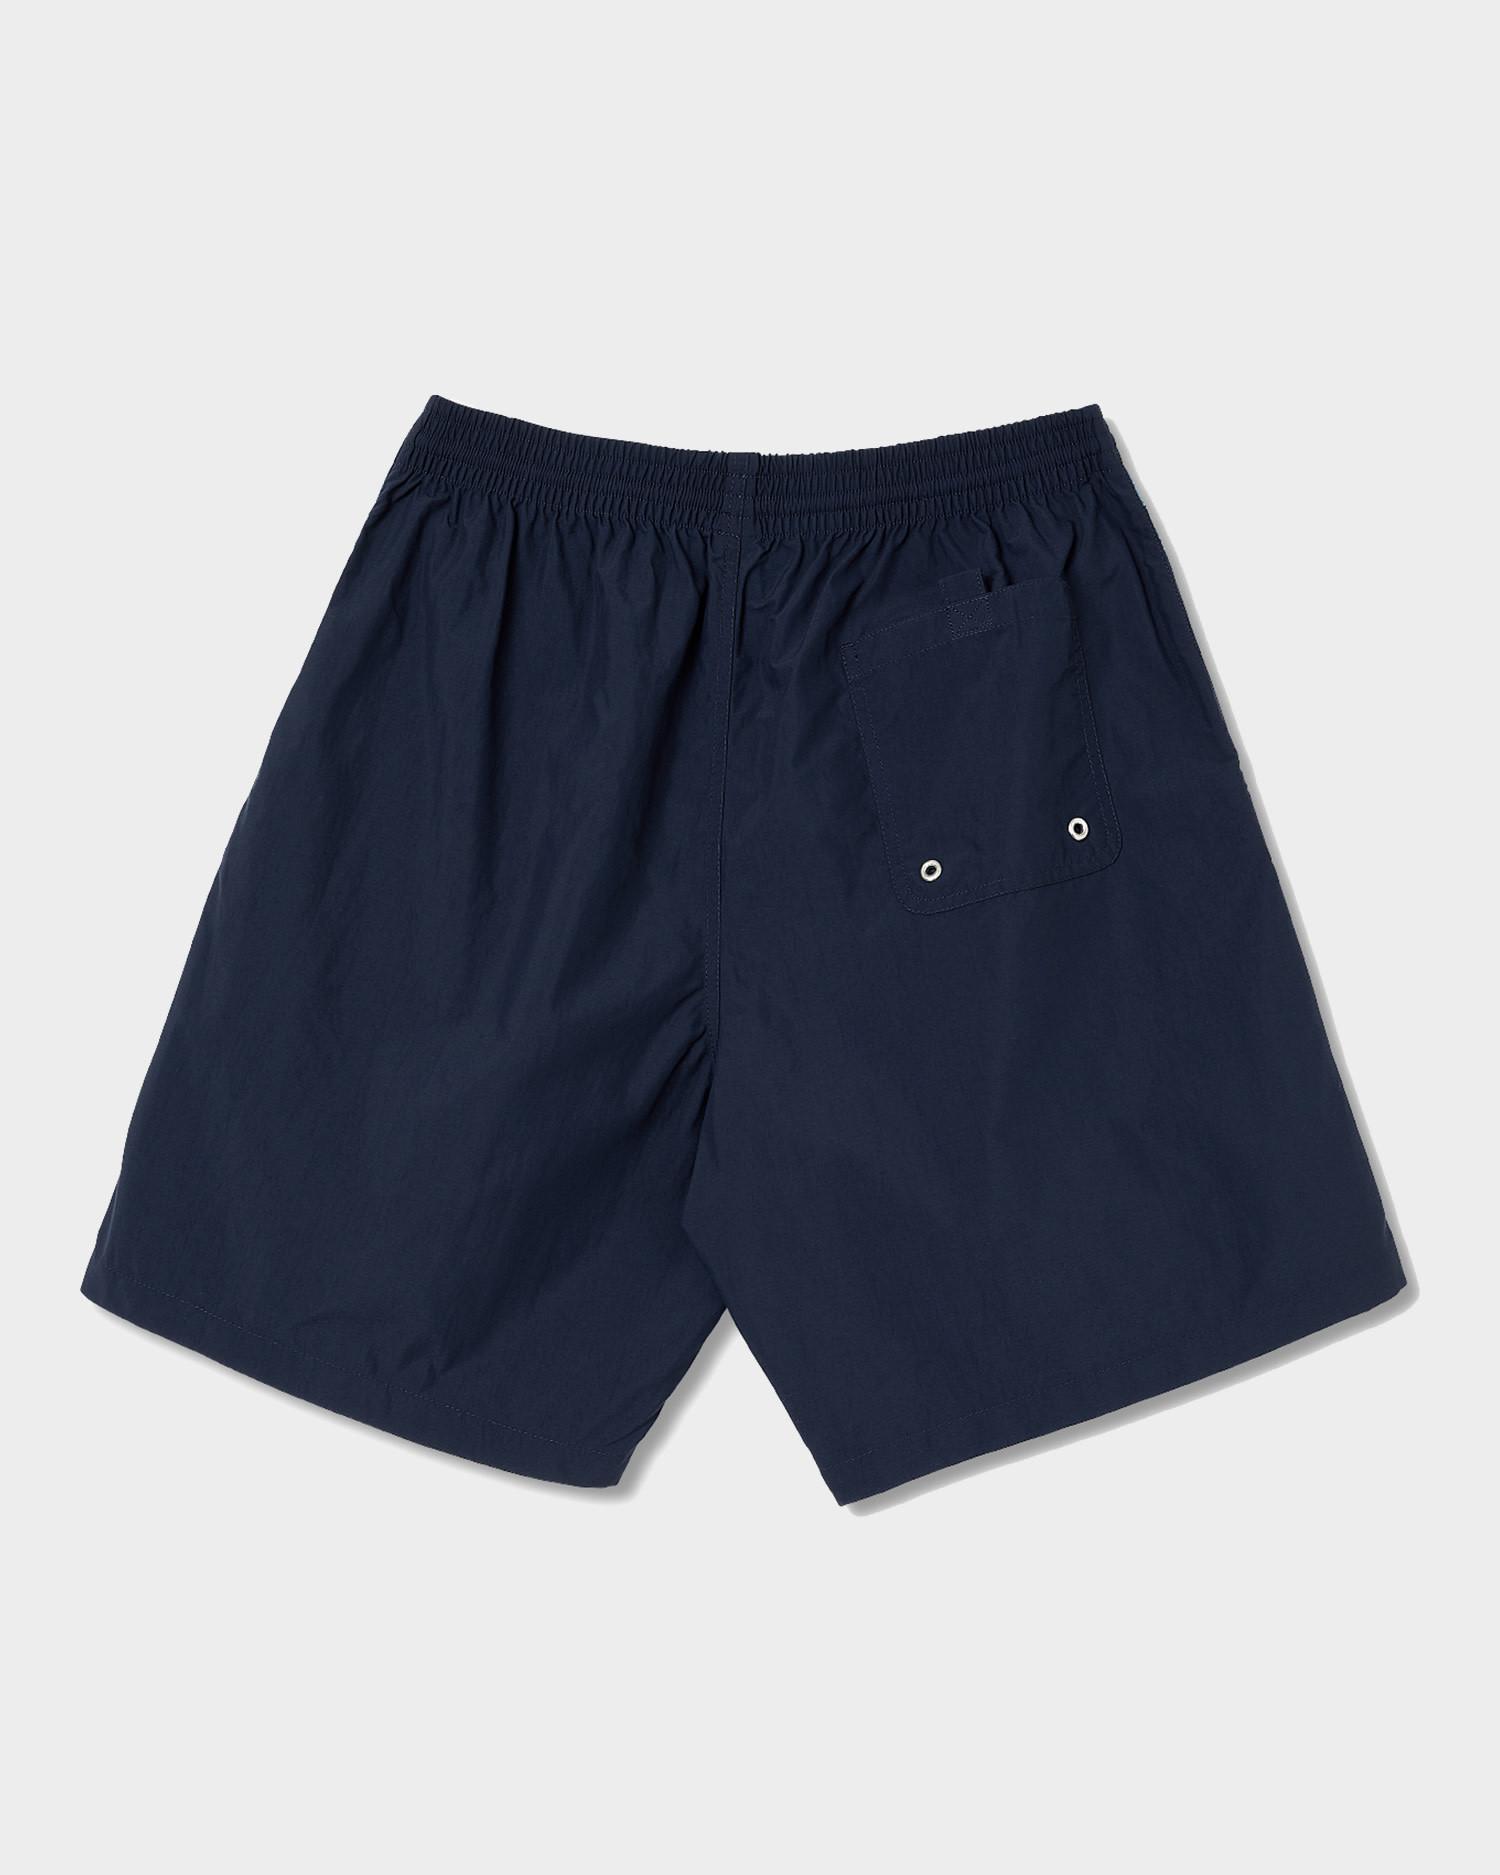 Polar Square Stripe City/Swim Shorts Navy